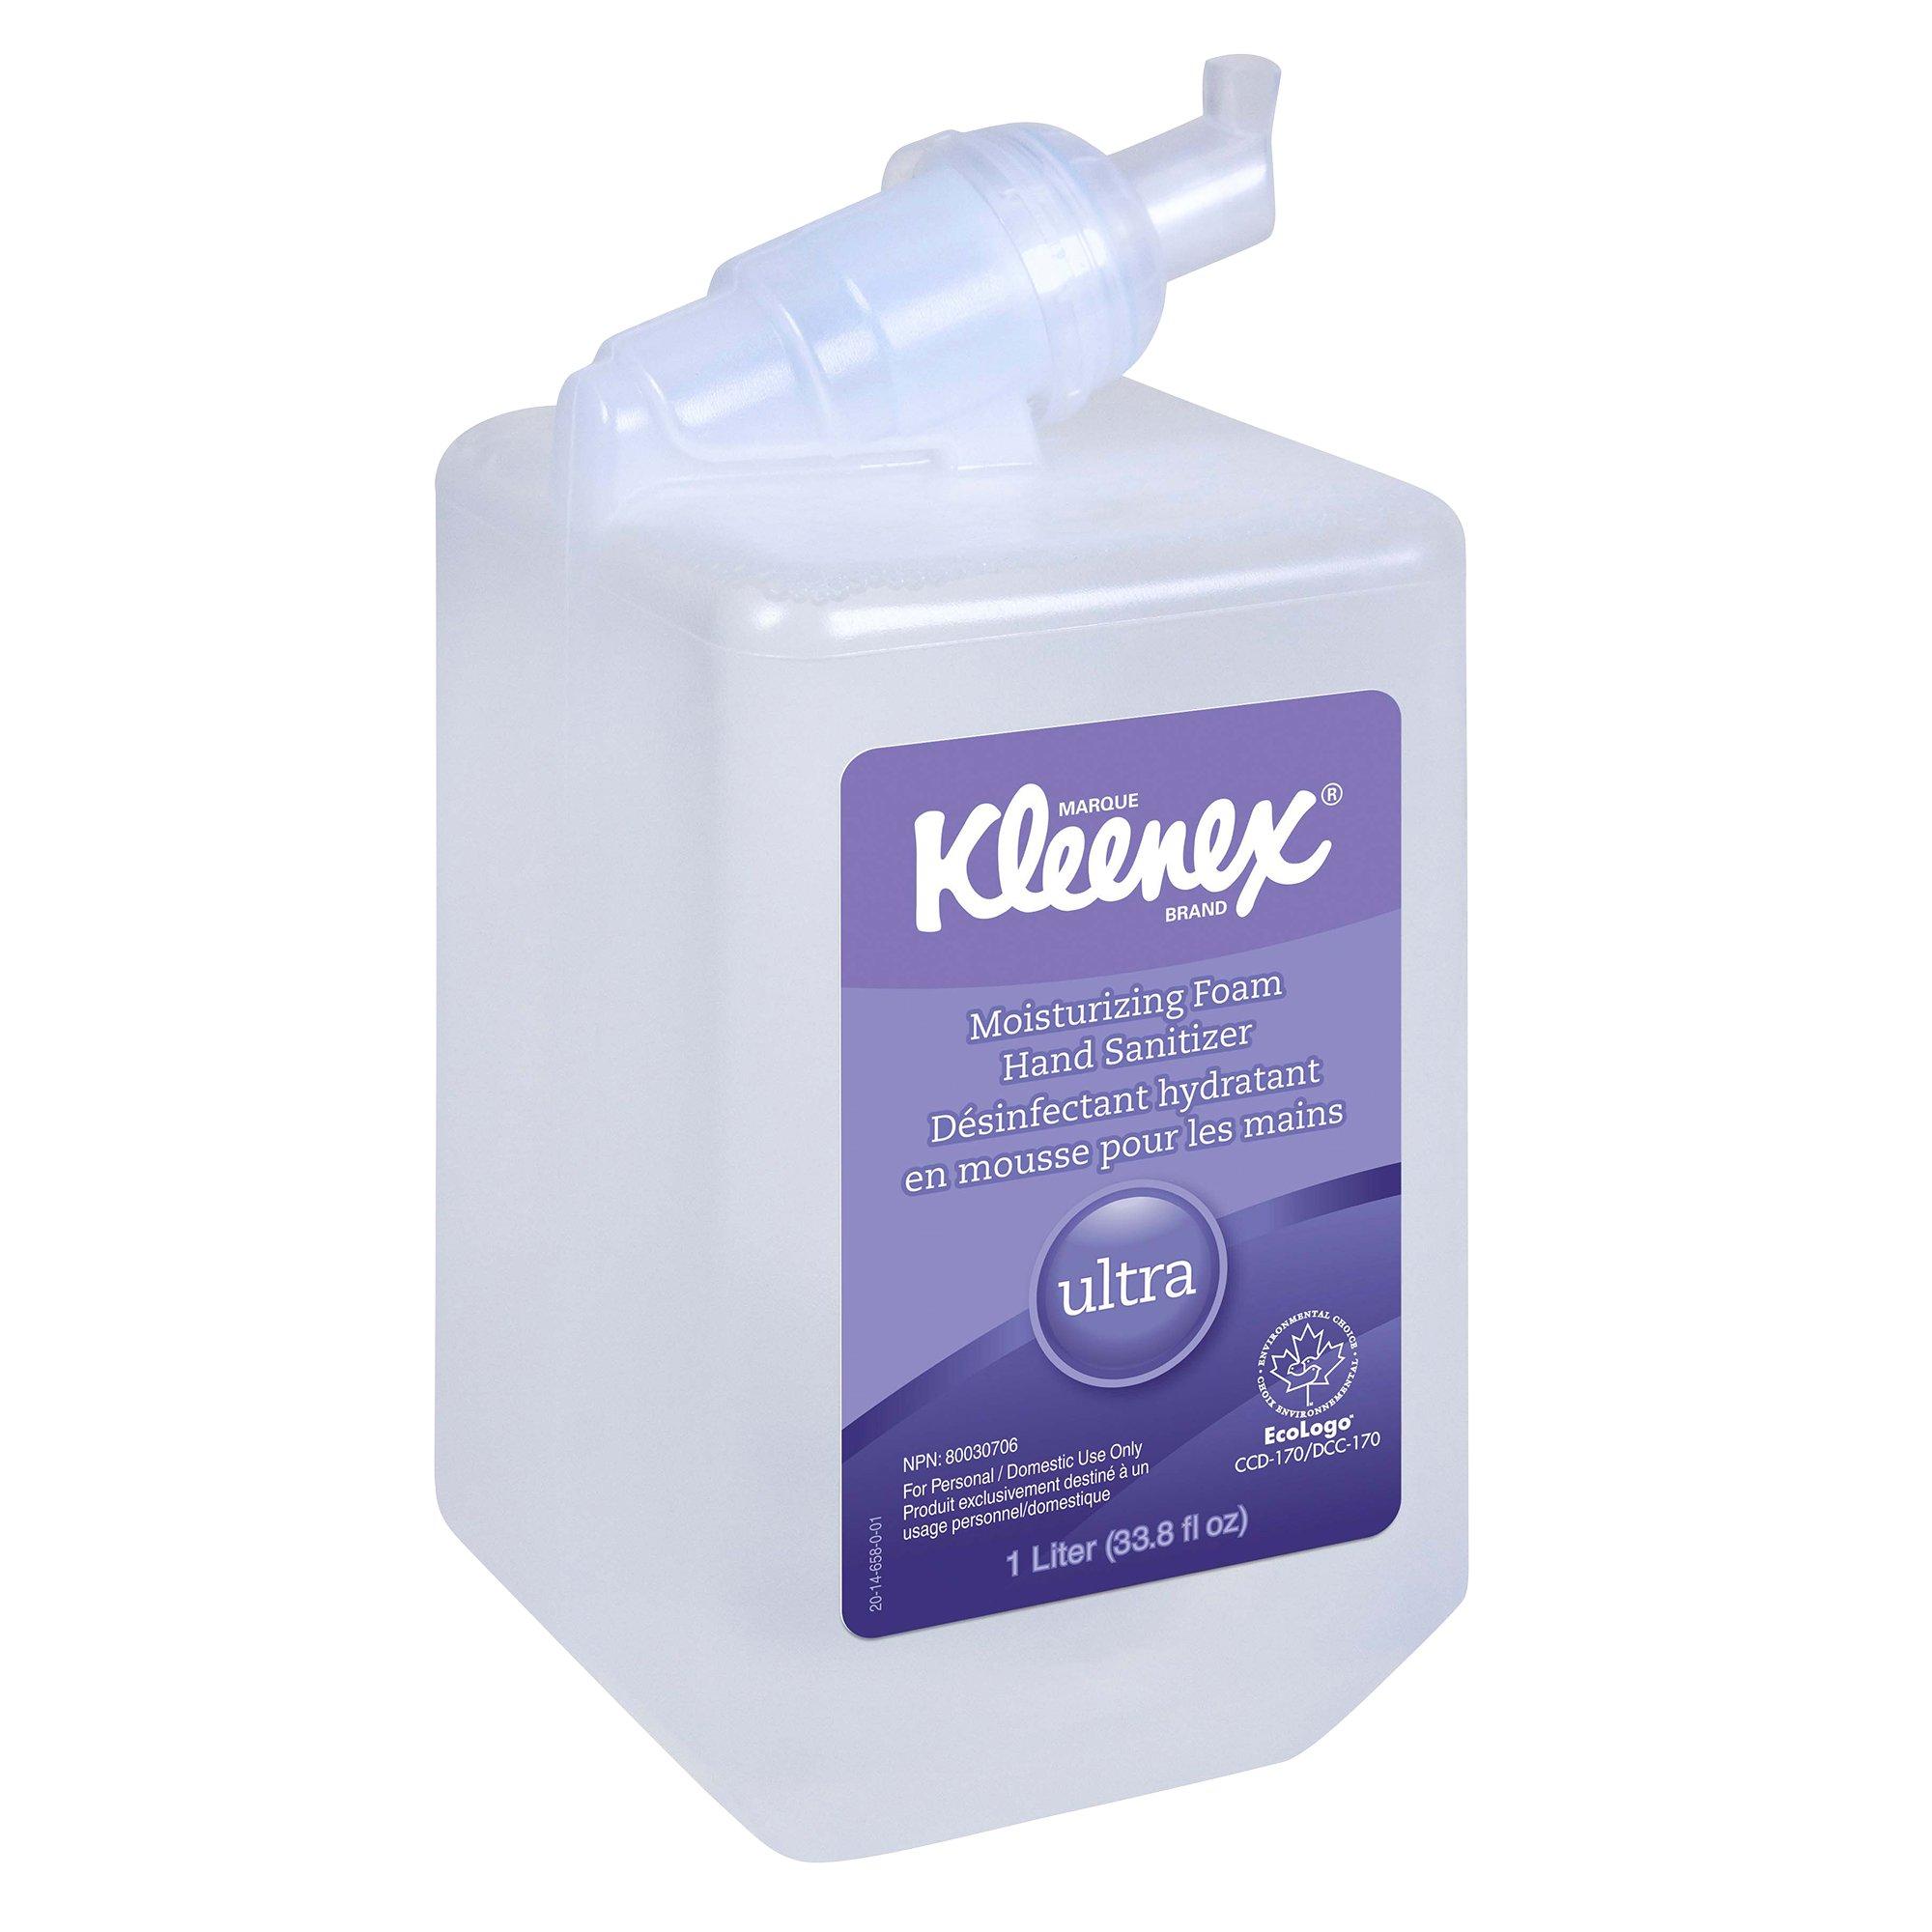 Kleenex Ultra Moisturizing Foam Hand Sanitizer (34700), Clear, 1.0 L Cassette Package, 6 Packages / Case